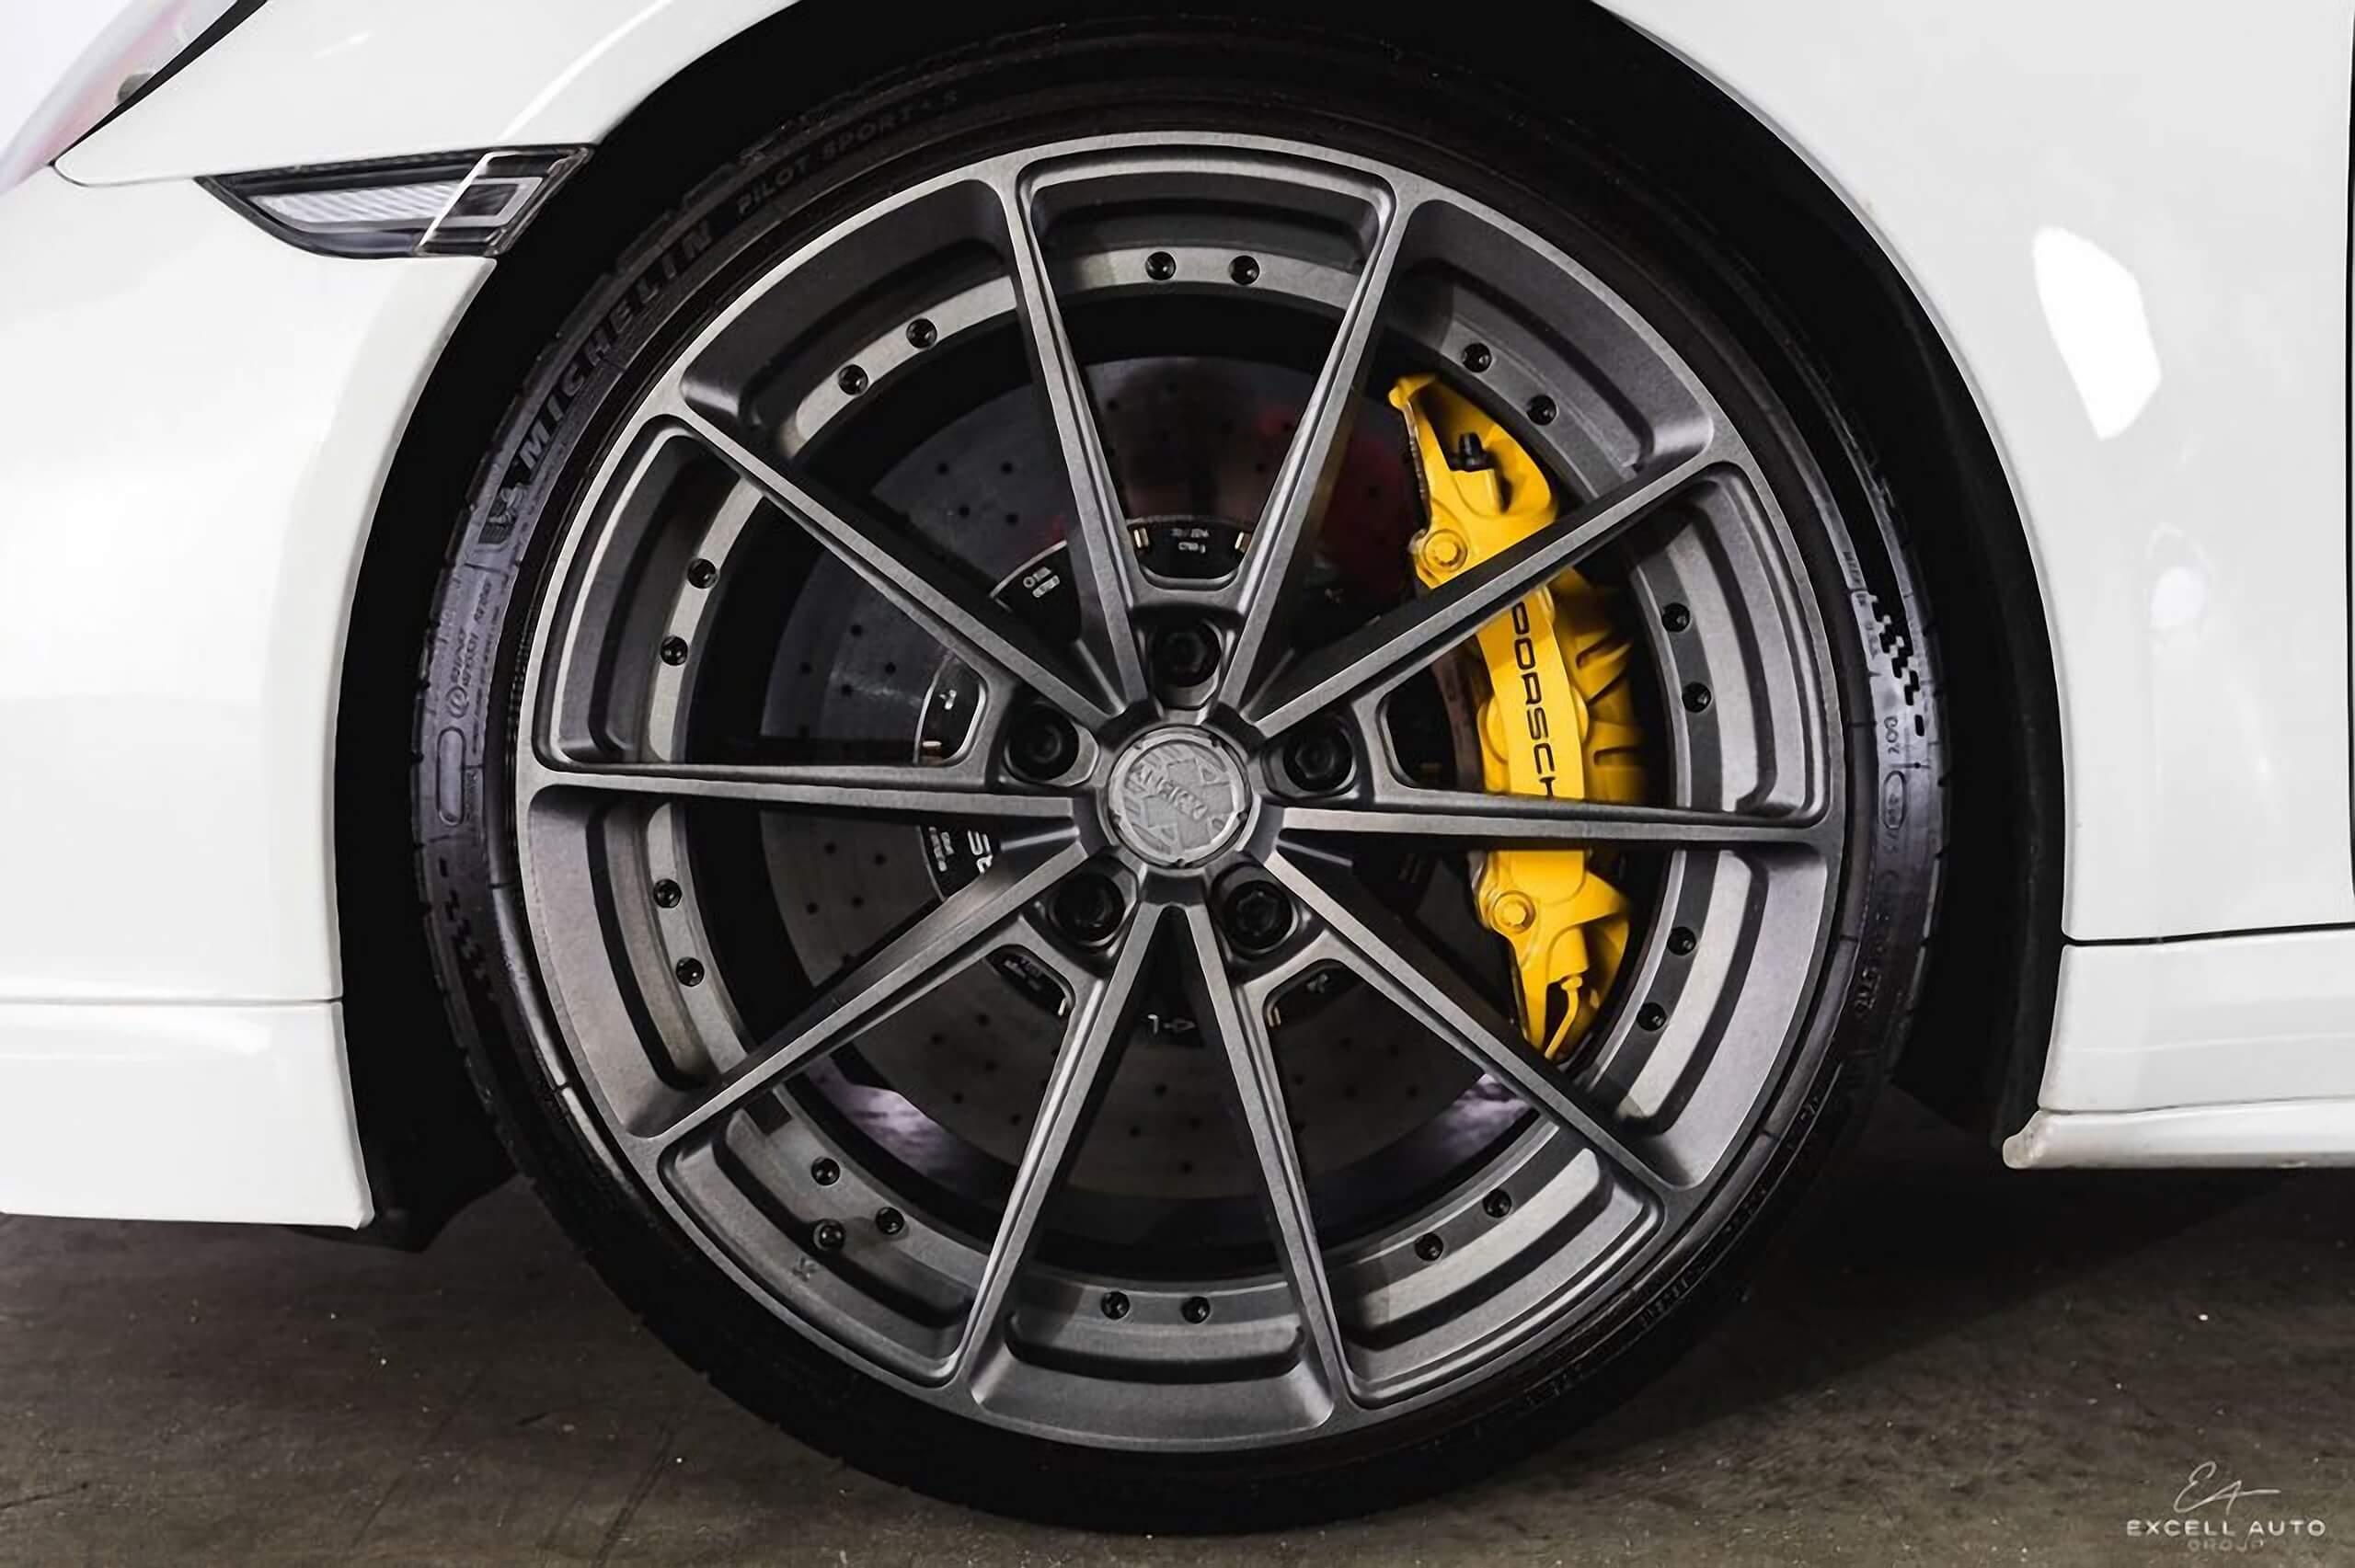 Porsche 911 Rims >> Porsche 911 Turbo S For Sale Tune Exhaust Anrky Wheels